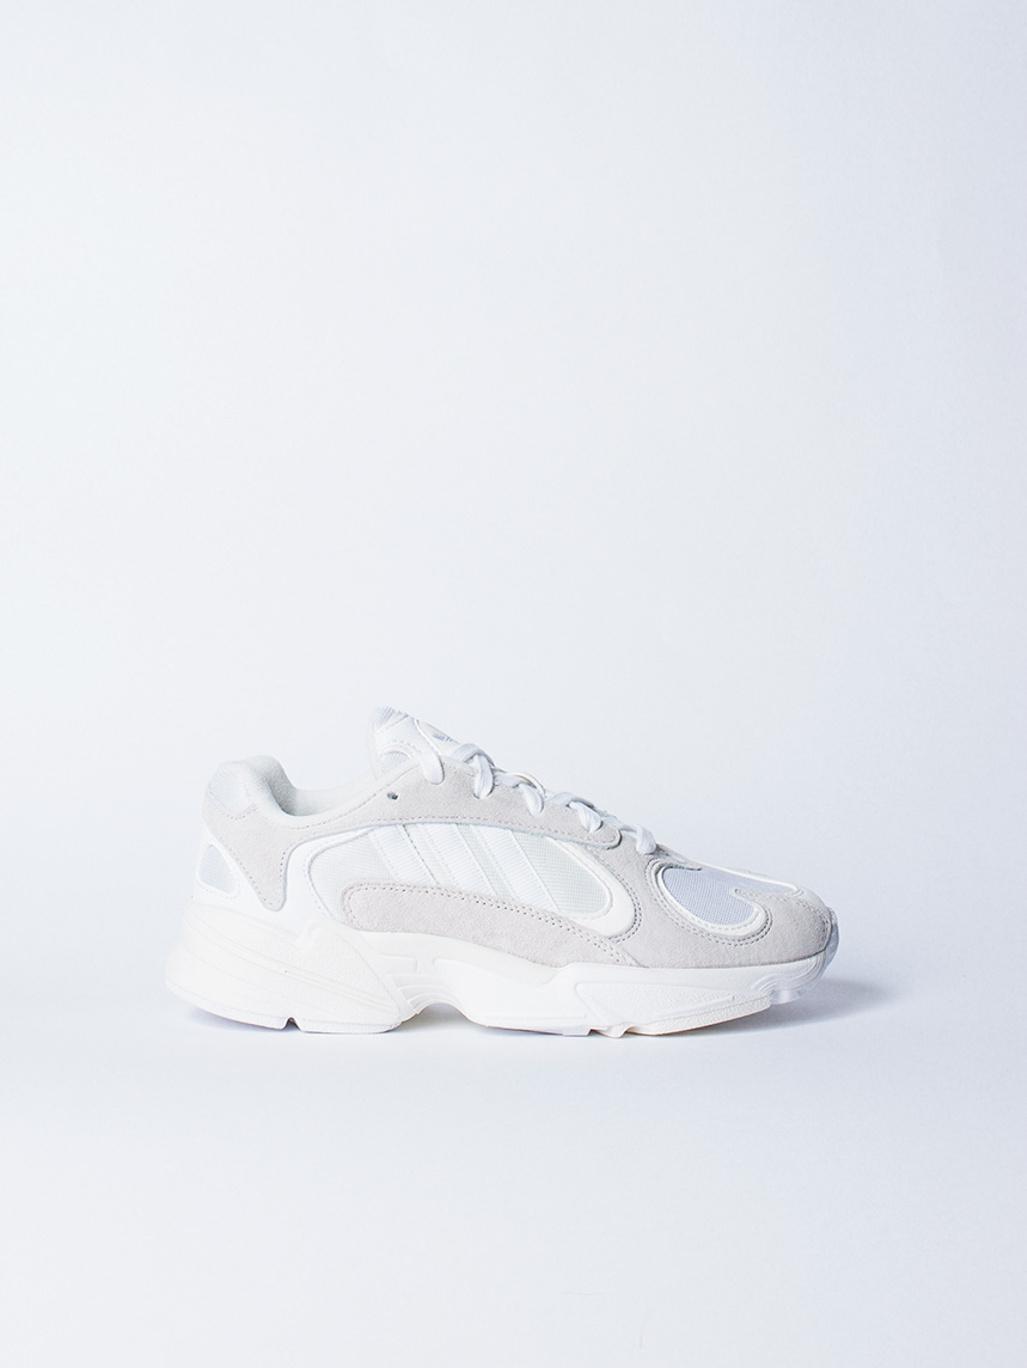 online retailer 0a247 b1020 Adidas Originals YUNG-1 CLOUD WHITE